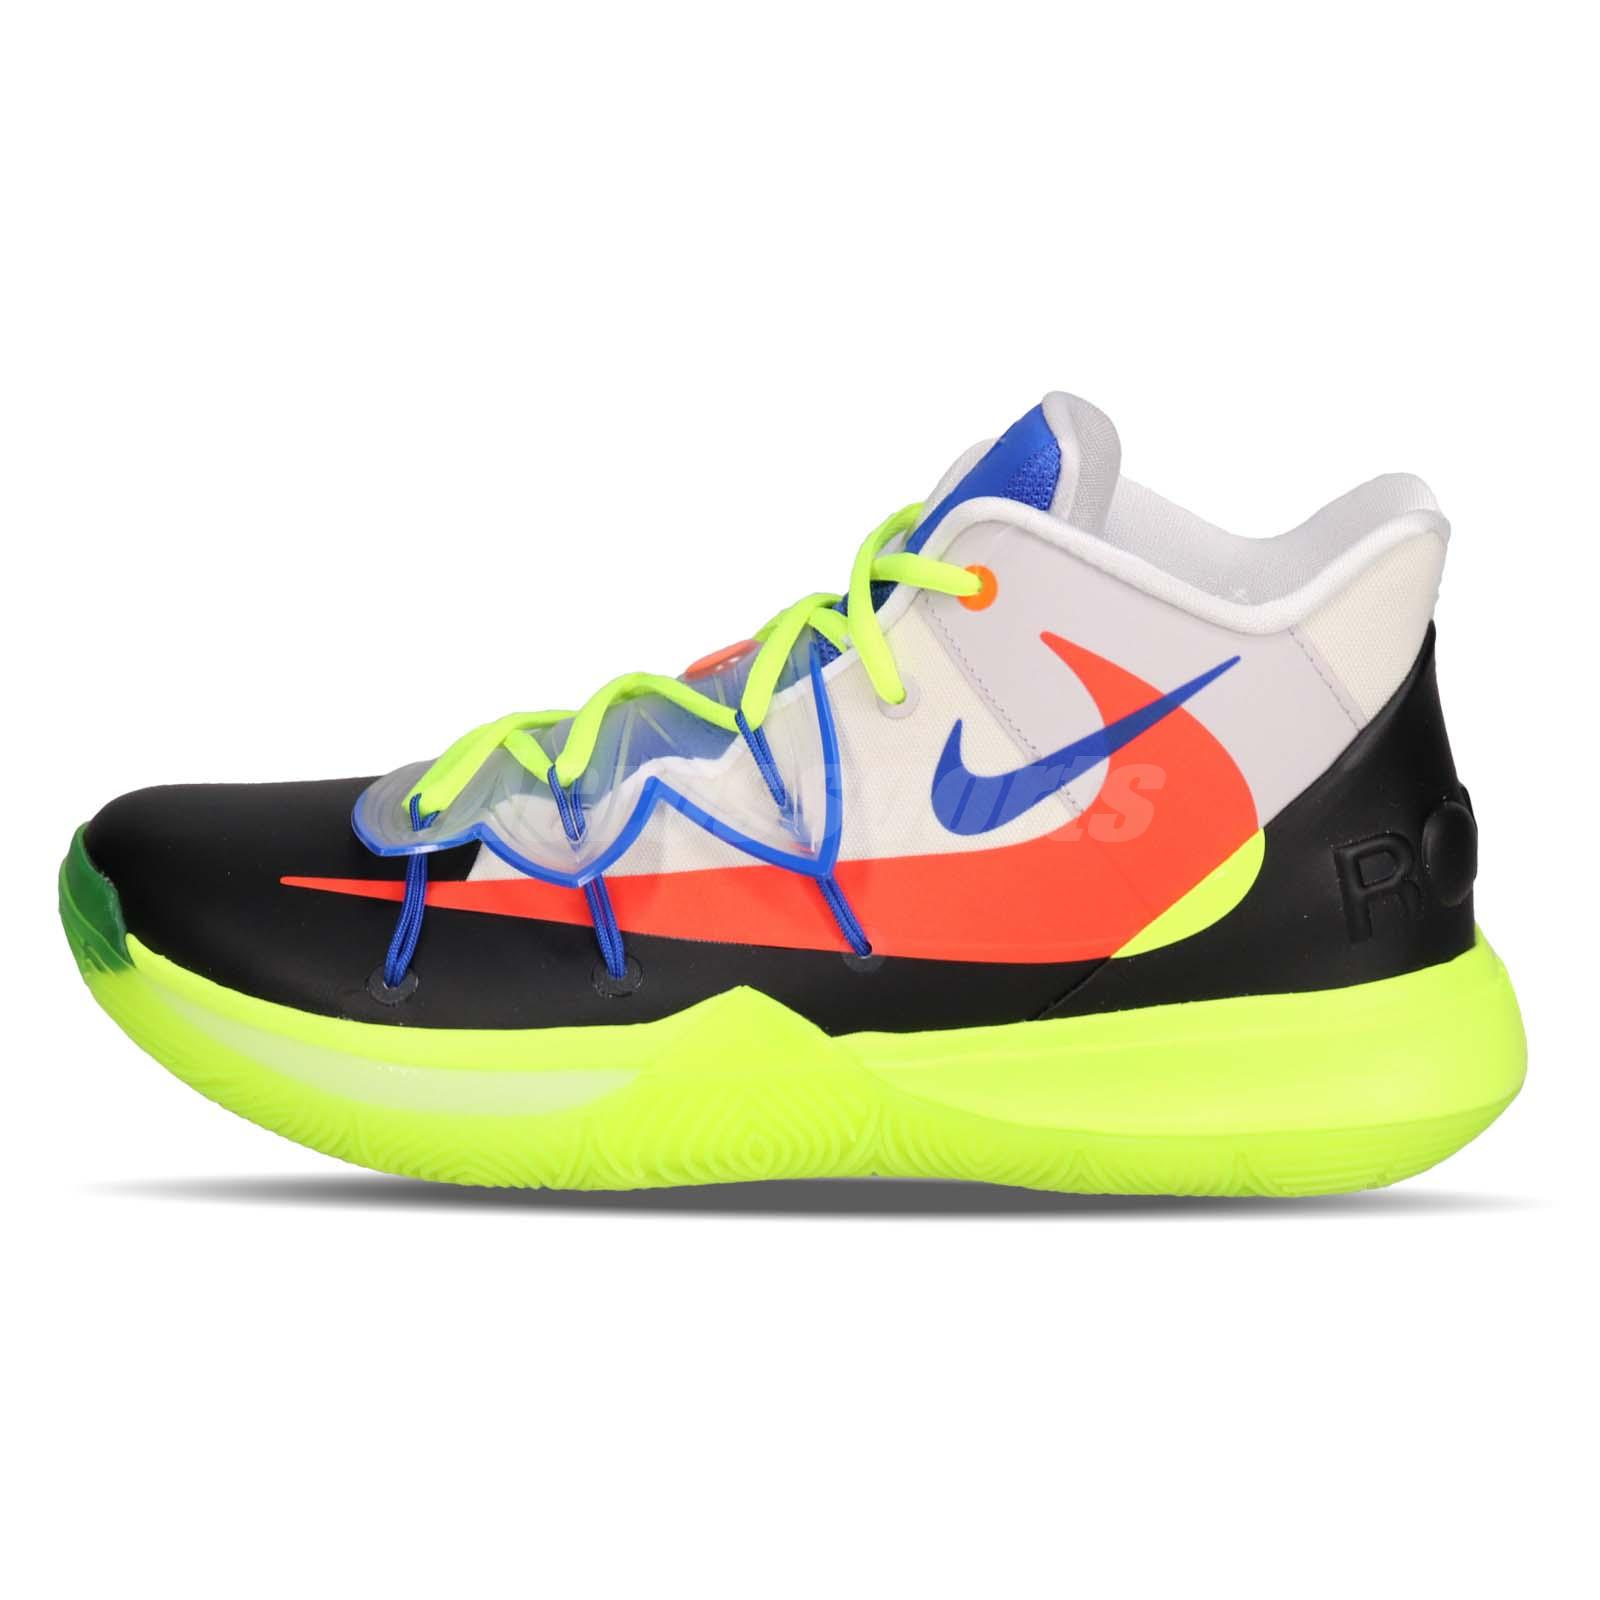 e21c9371a649 Nike Kyrie 5 EP X ROKIT Multi-Color NBA All Star 2019 Basketball Shoe CJ7853 -900